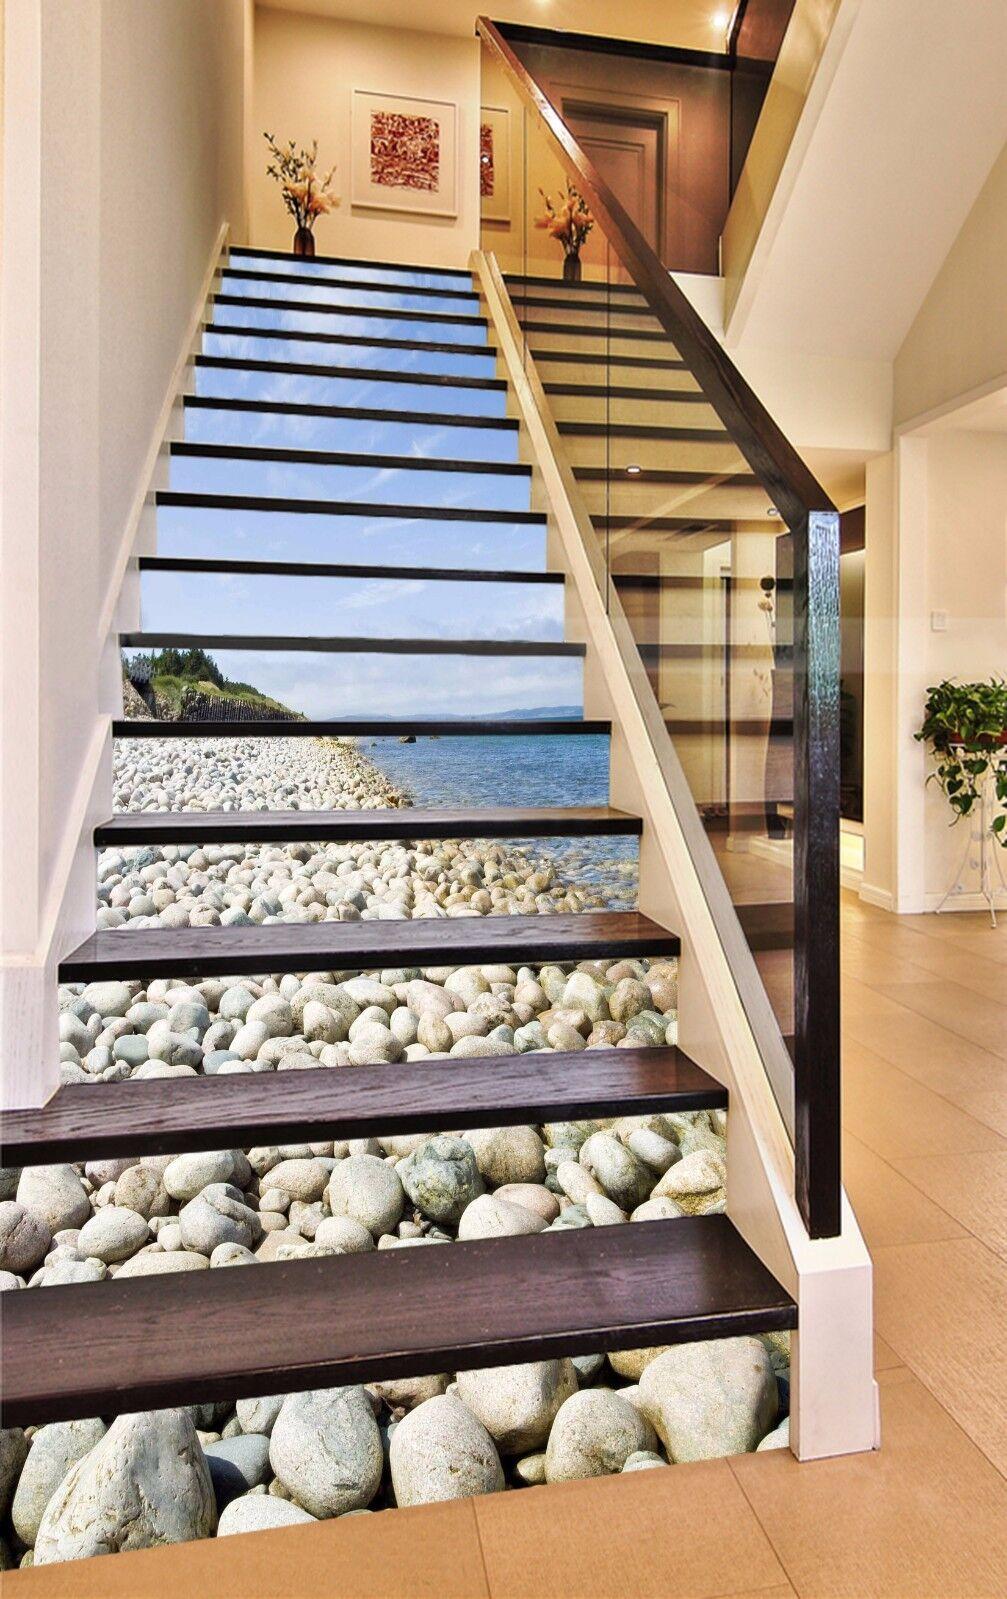 3D Seaside Stone 2464 Risers Decoration Photo Mural Vinyl Decal Wallpaper CA